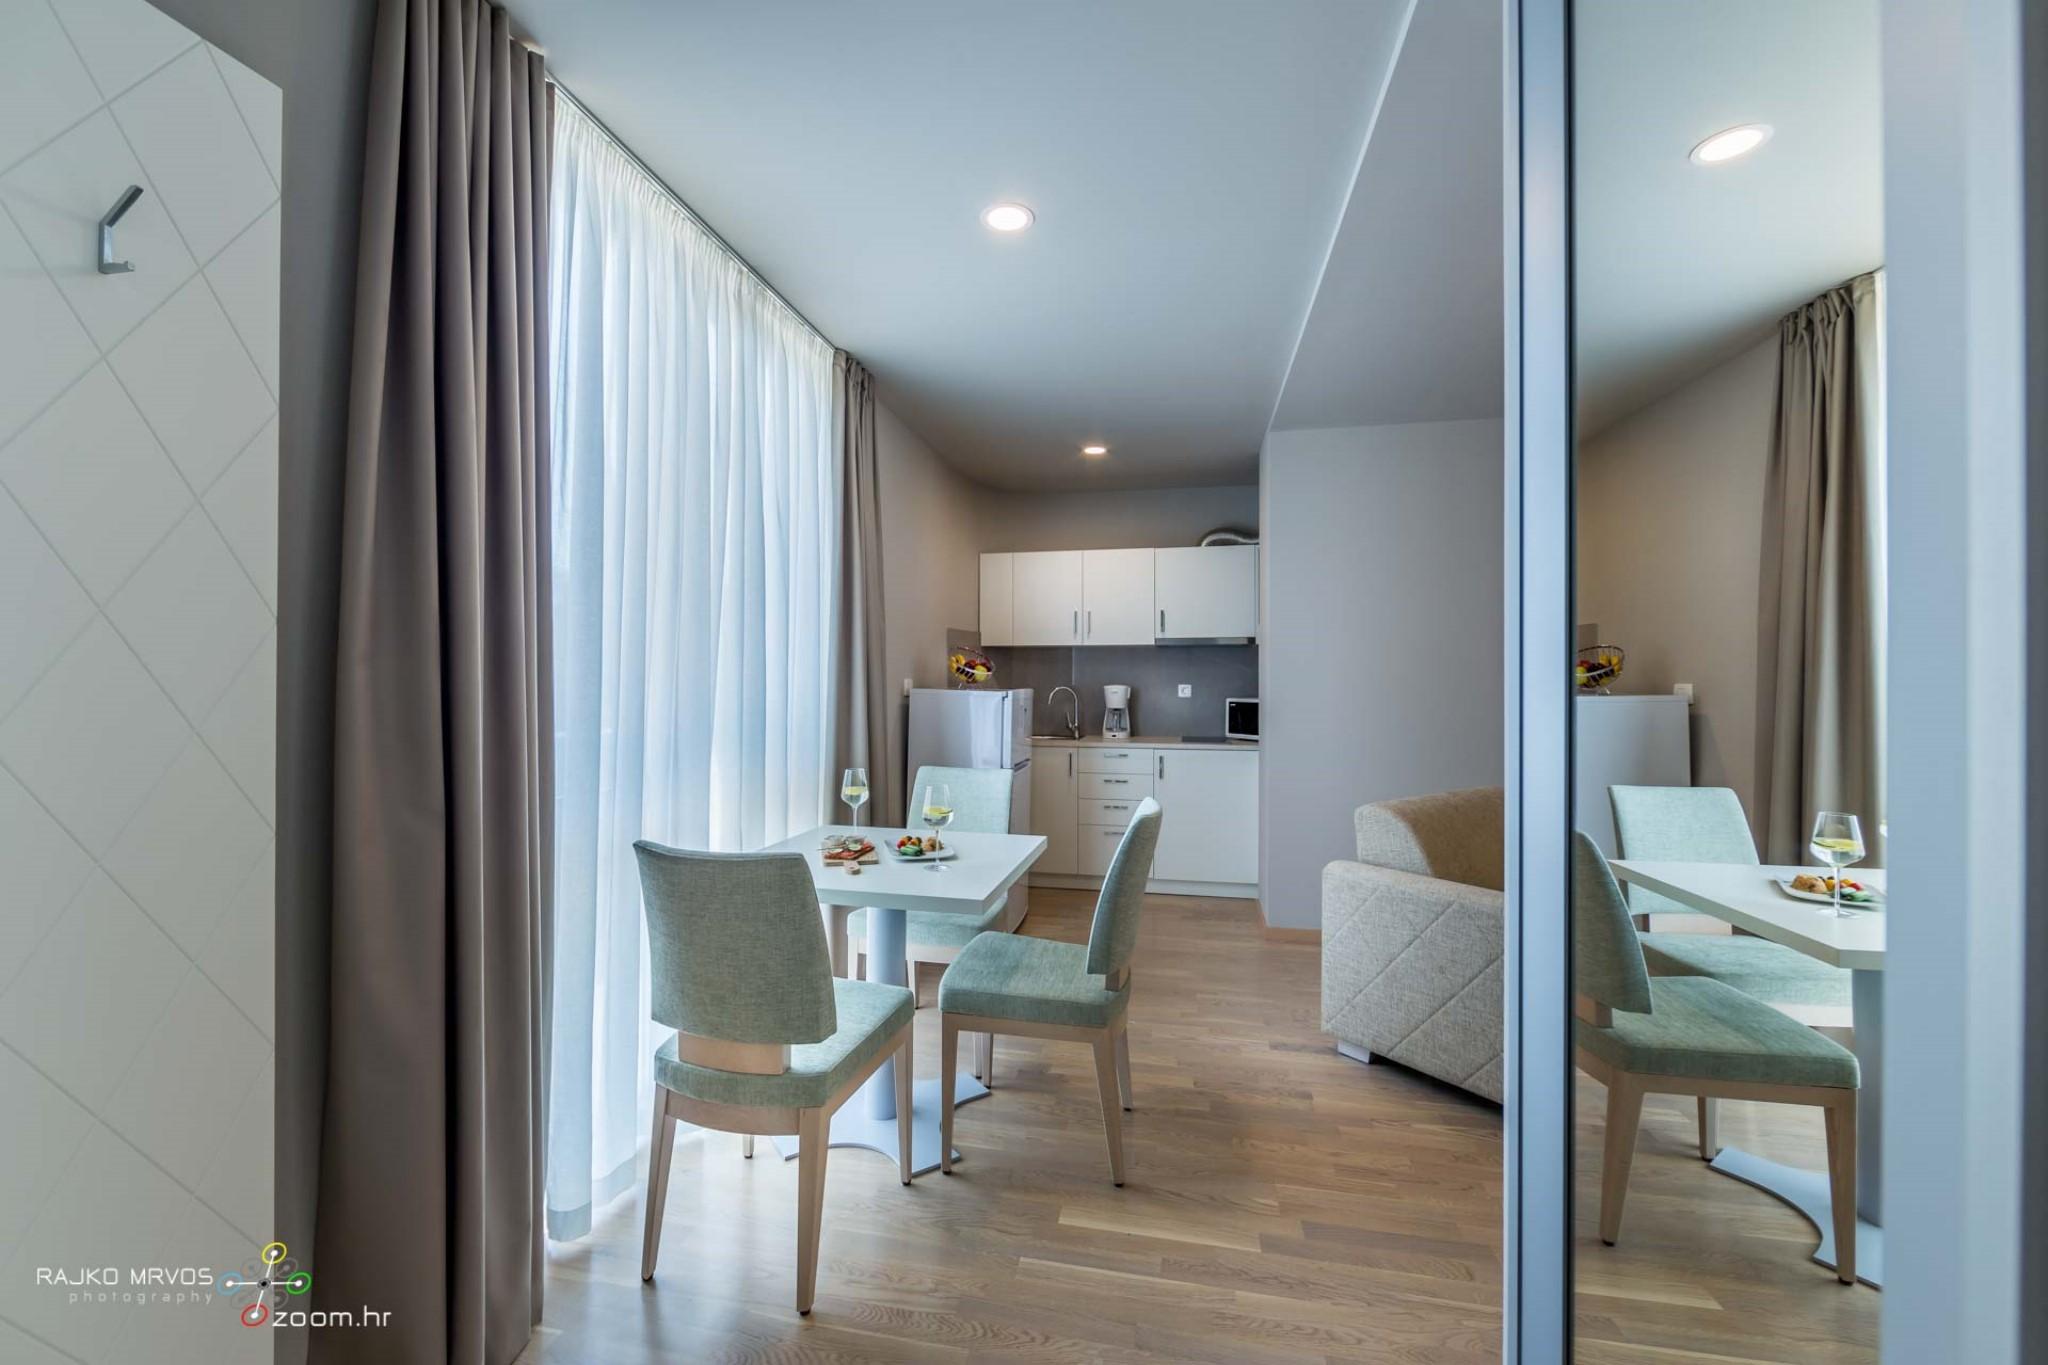 fotografiranje-interijera-fotograf-eksterijera-apartmana-vila-kuca-apartman-Preelook-31